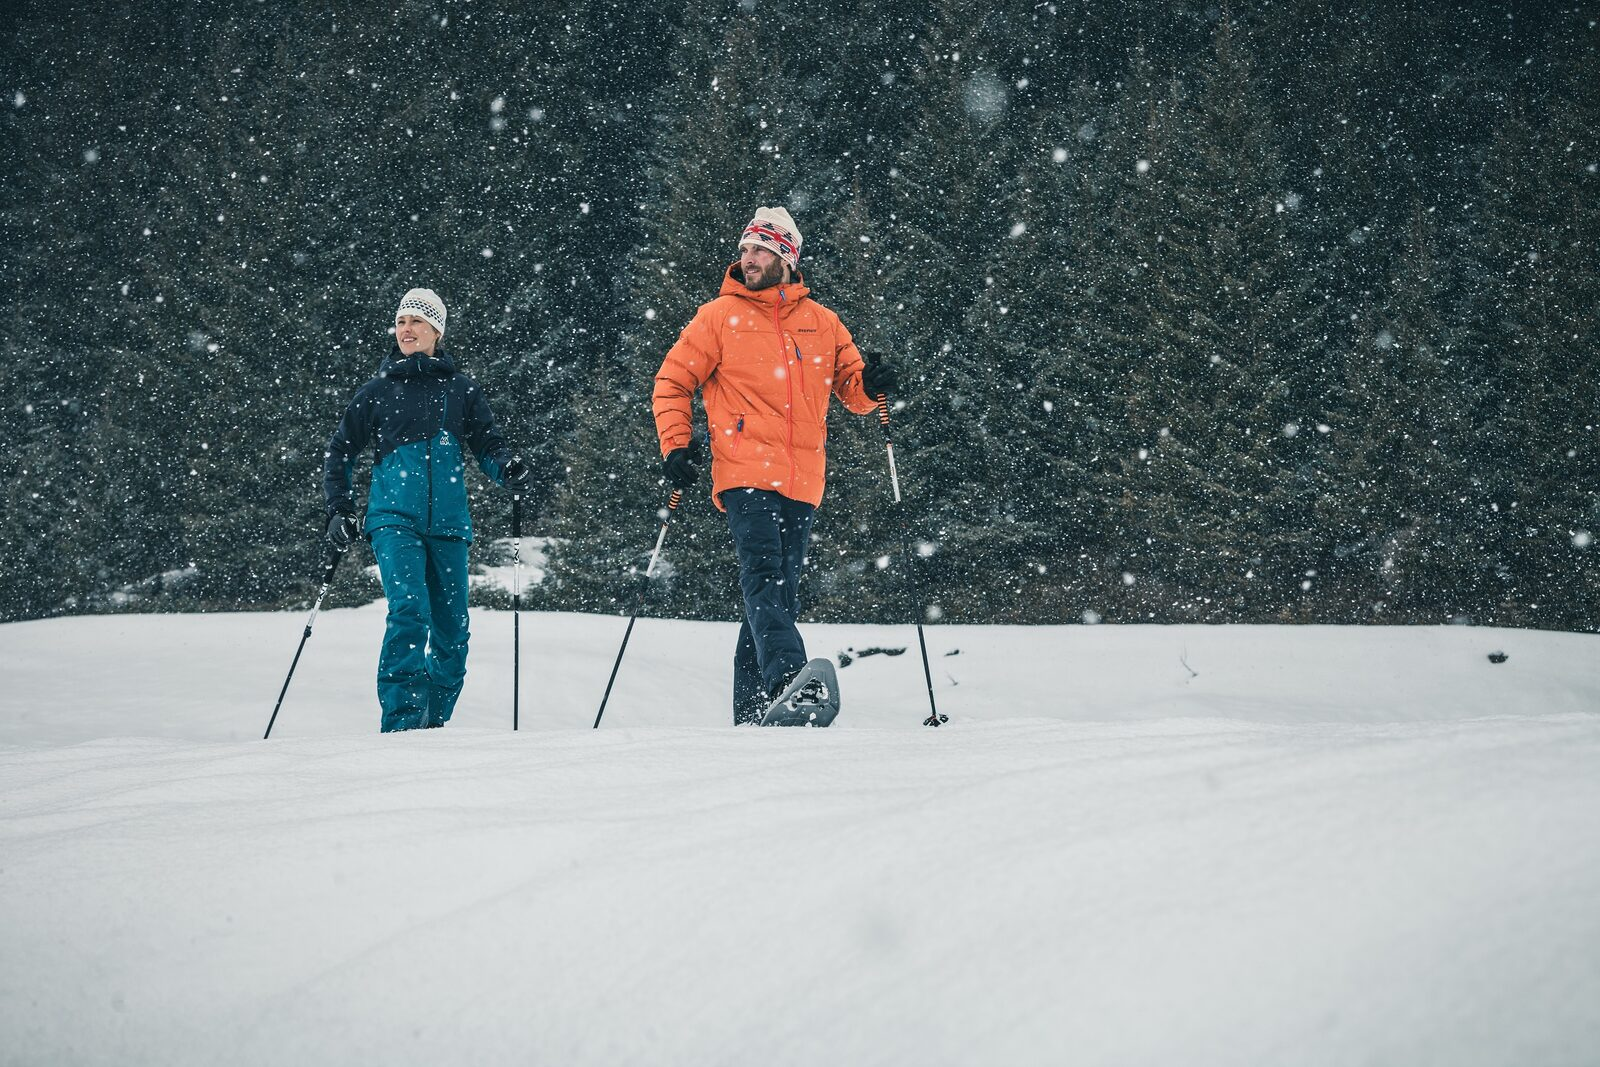 Schneeschuhwandern in Ehrwald